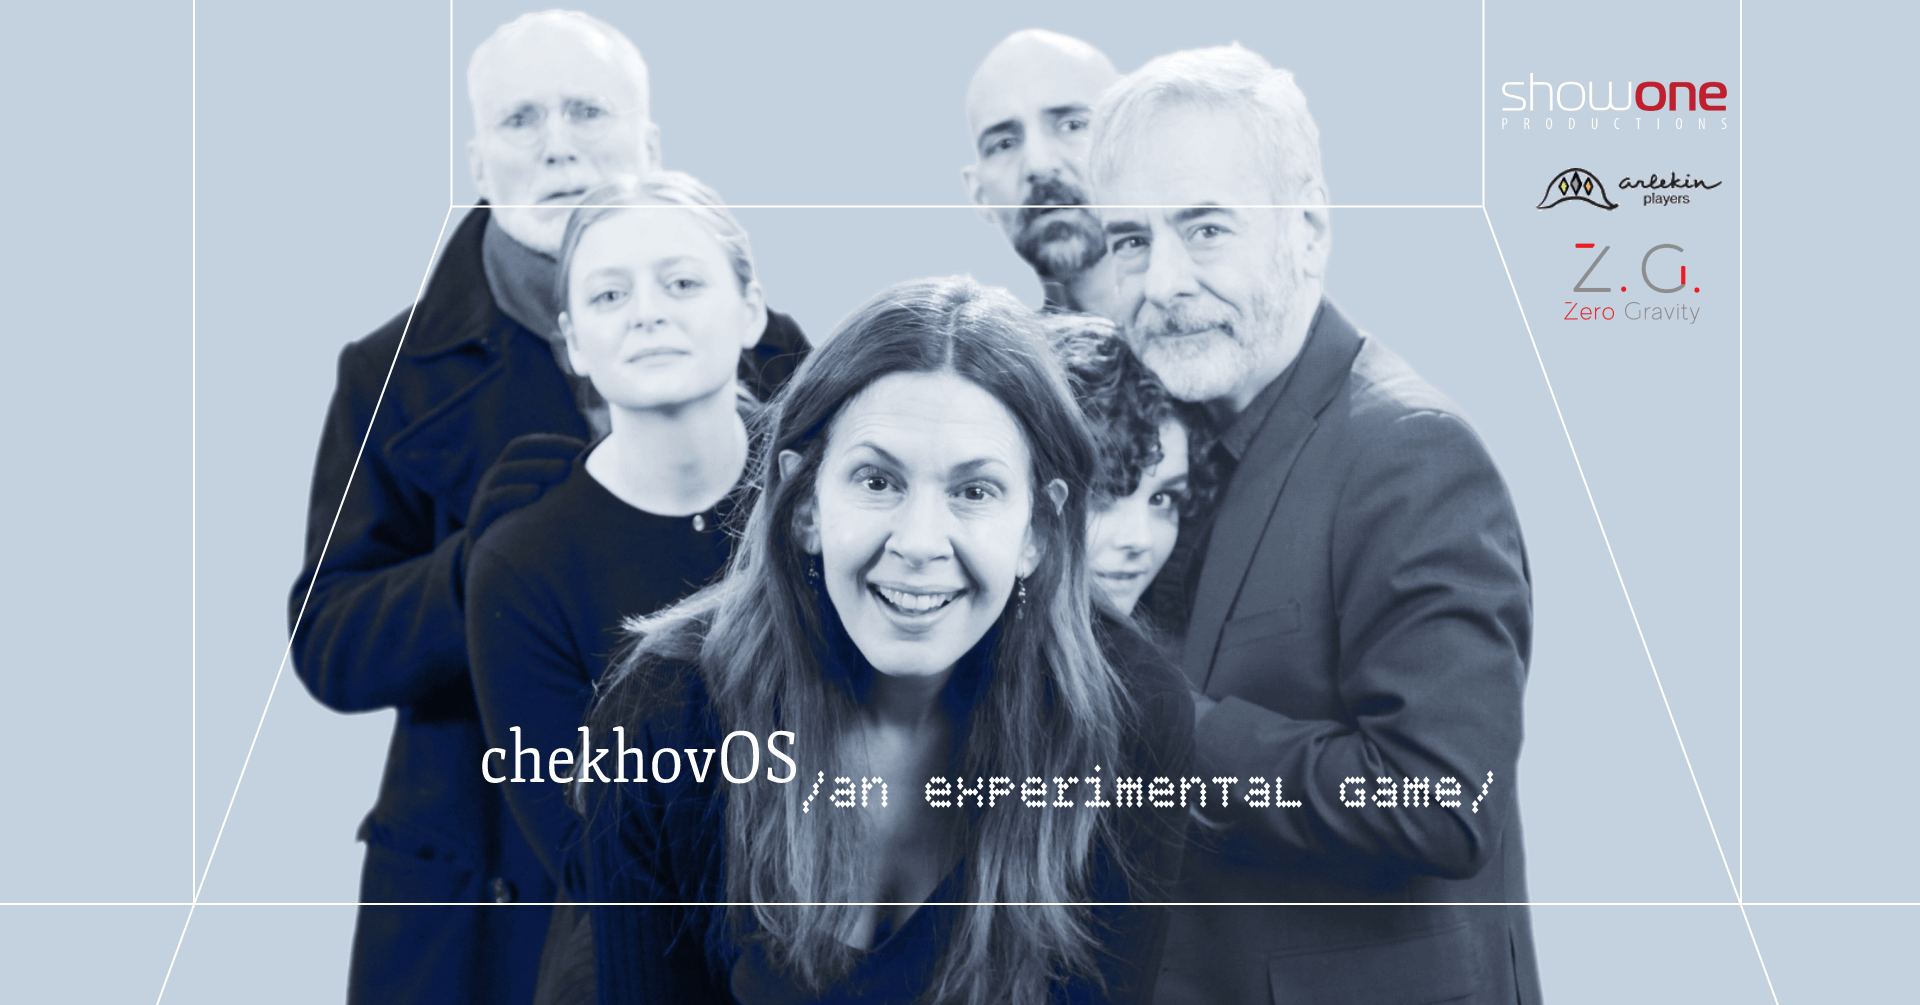 chekhovOS /an experimental game/